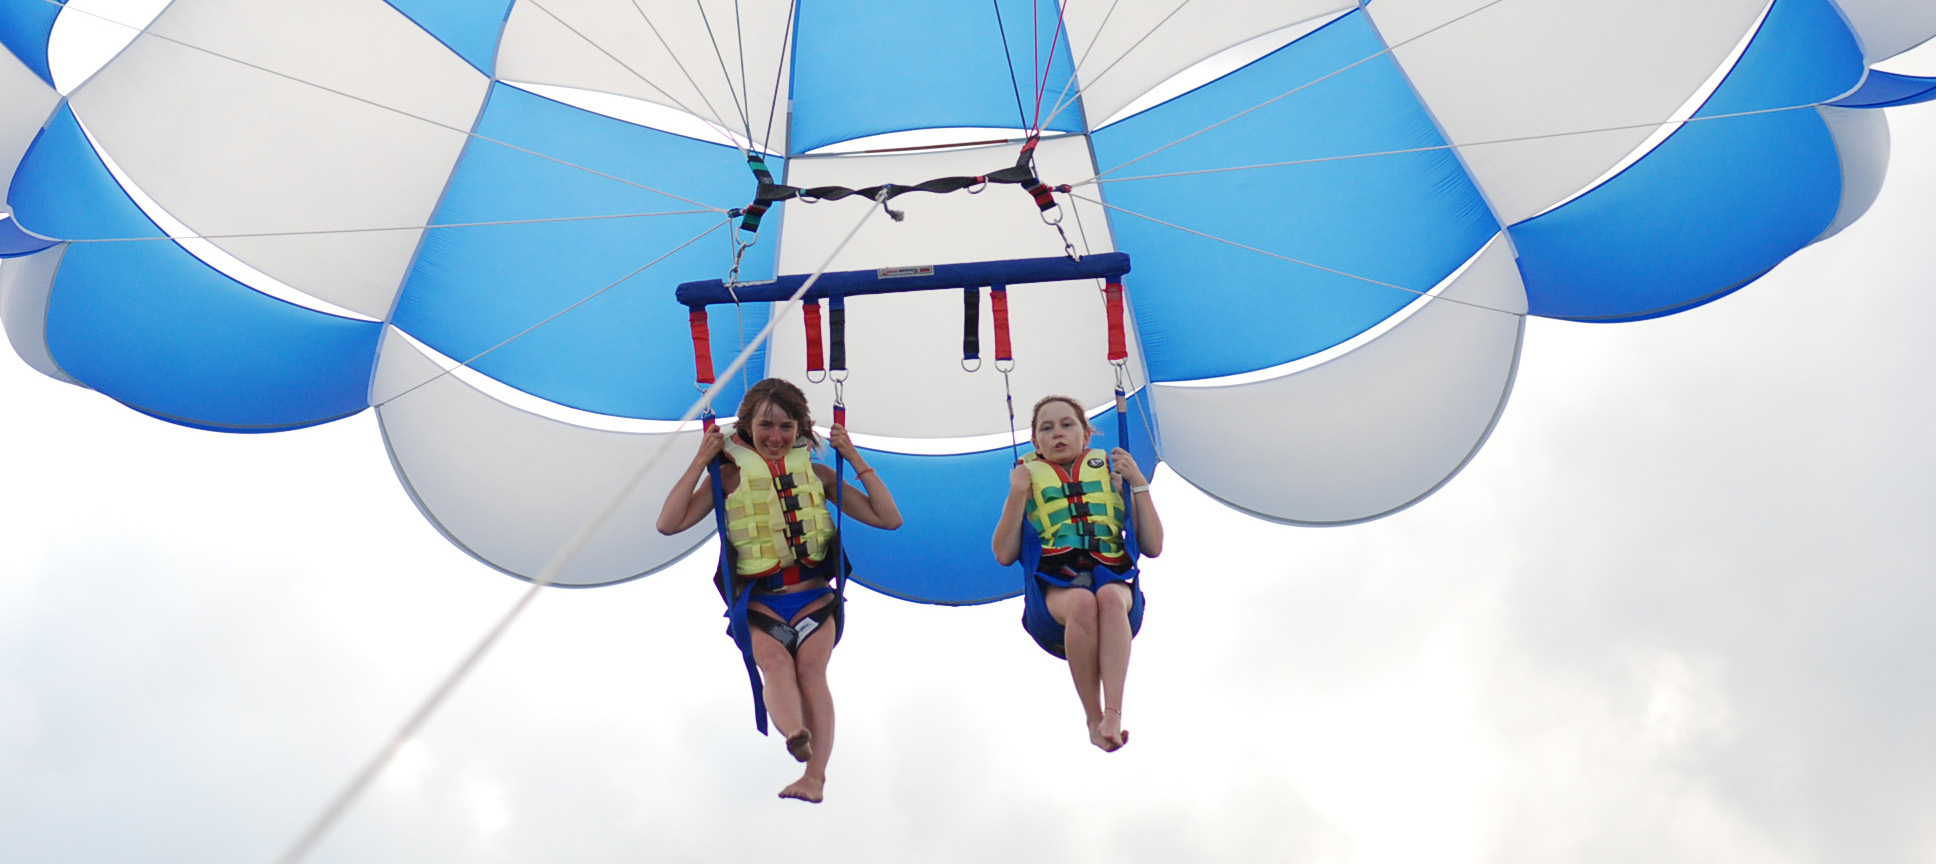 Life jackets for parasailing parachutes